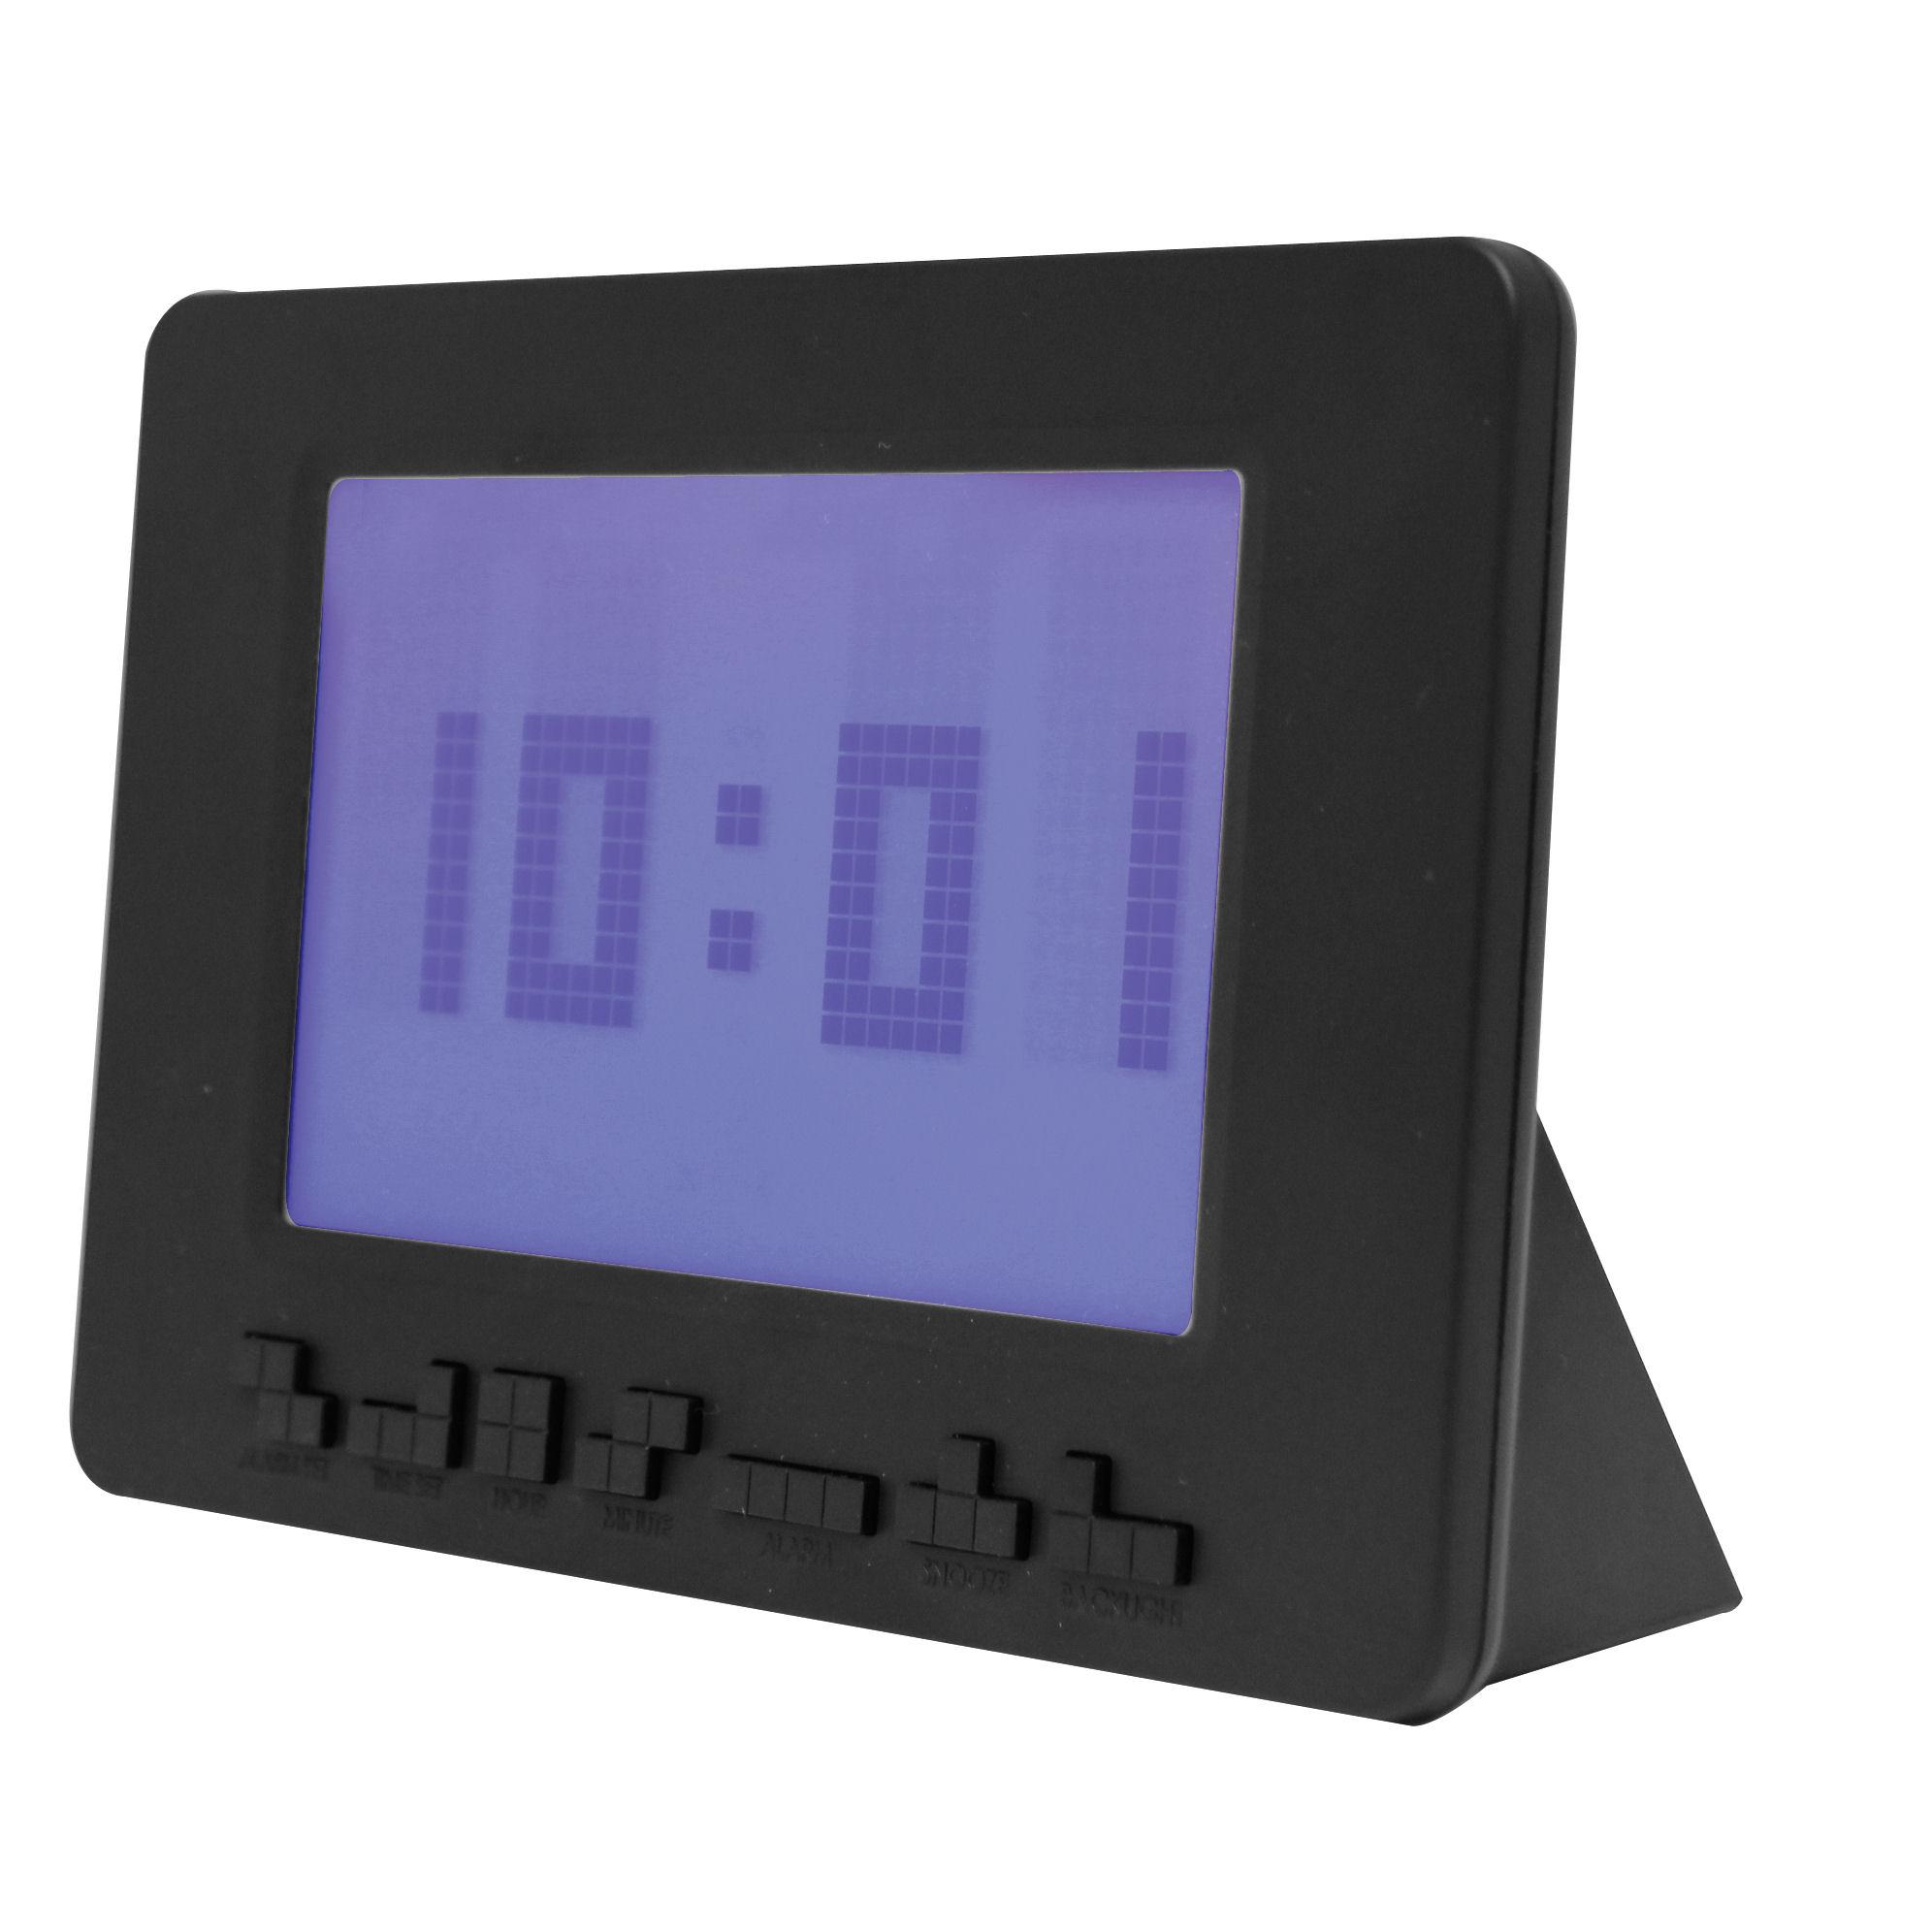 Animated Alarm Clock Tetris animated alarm clock